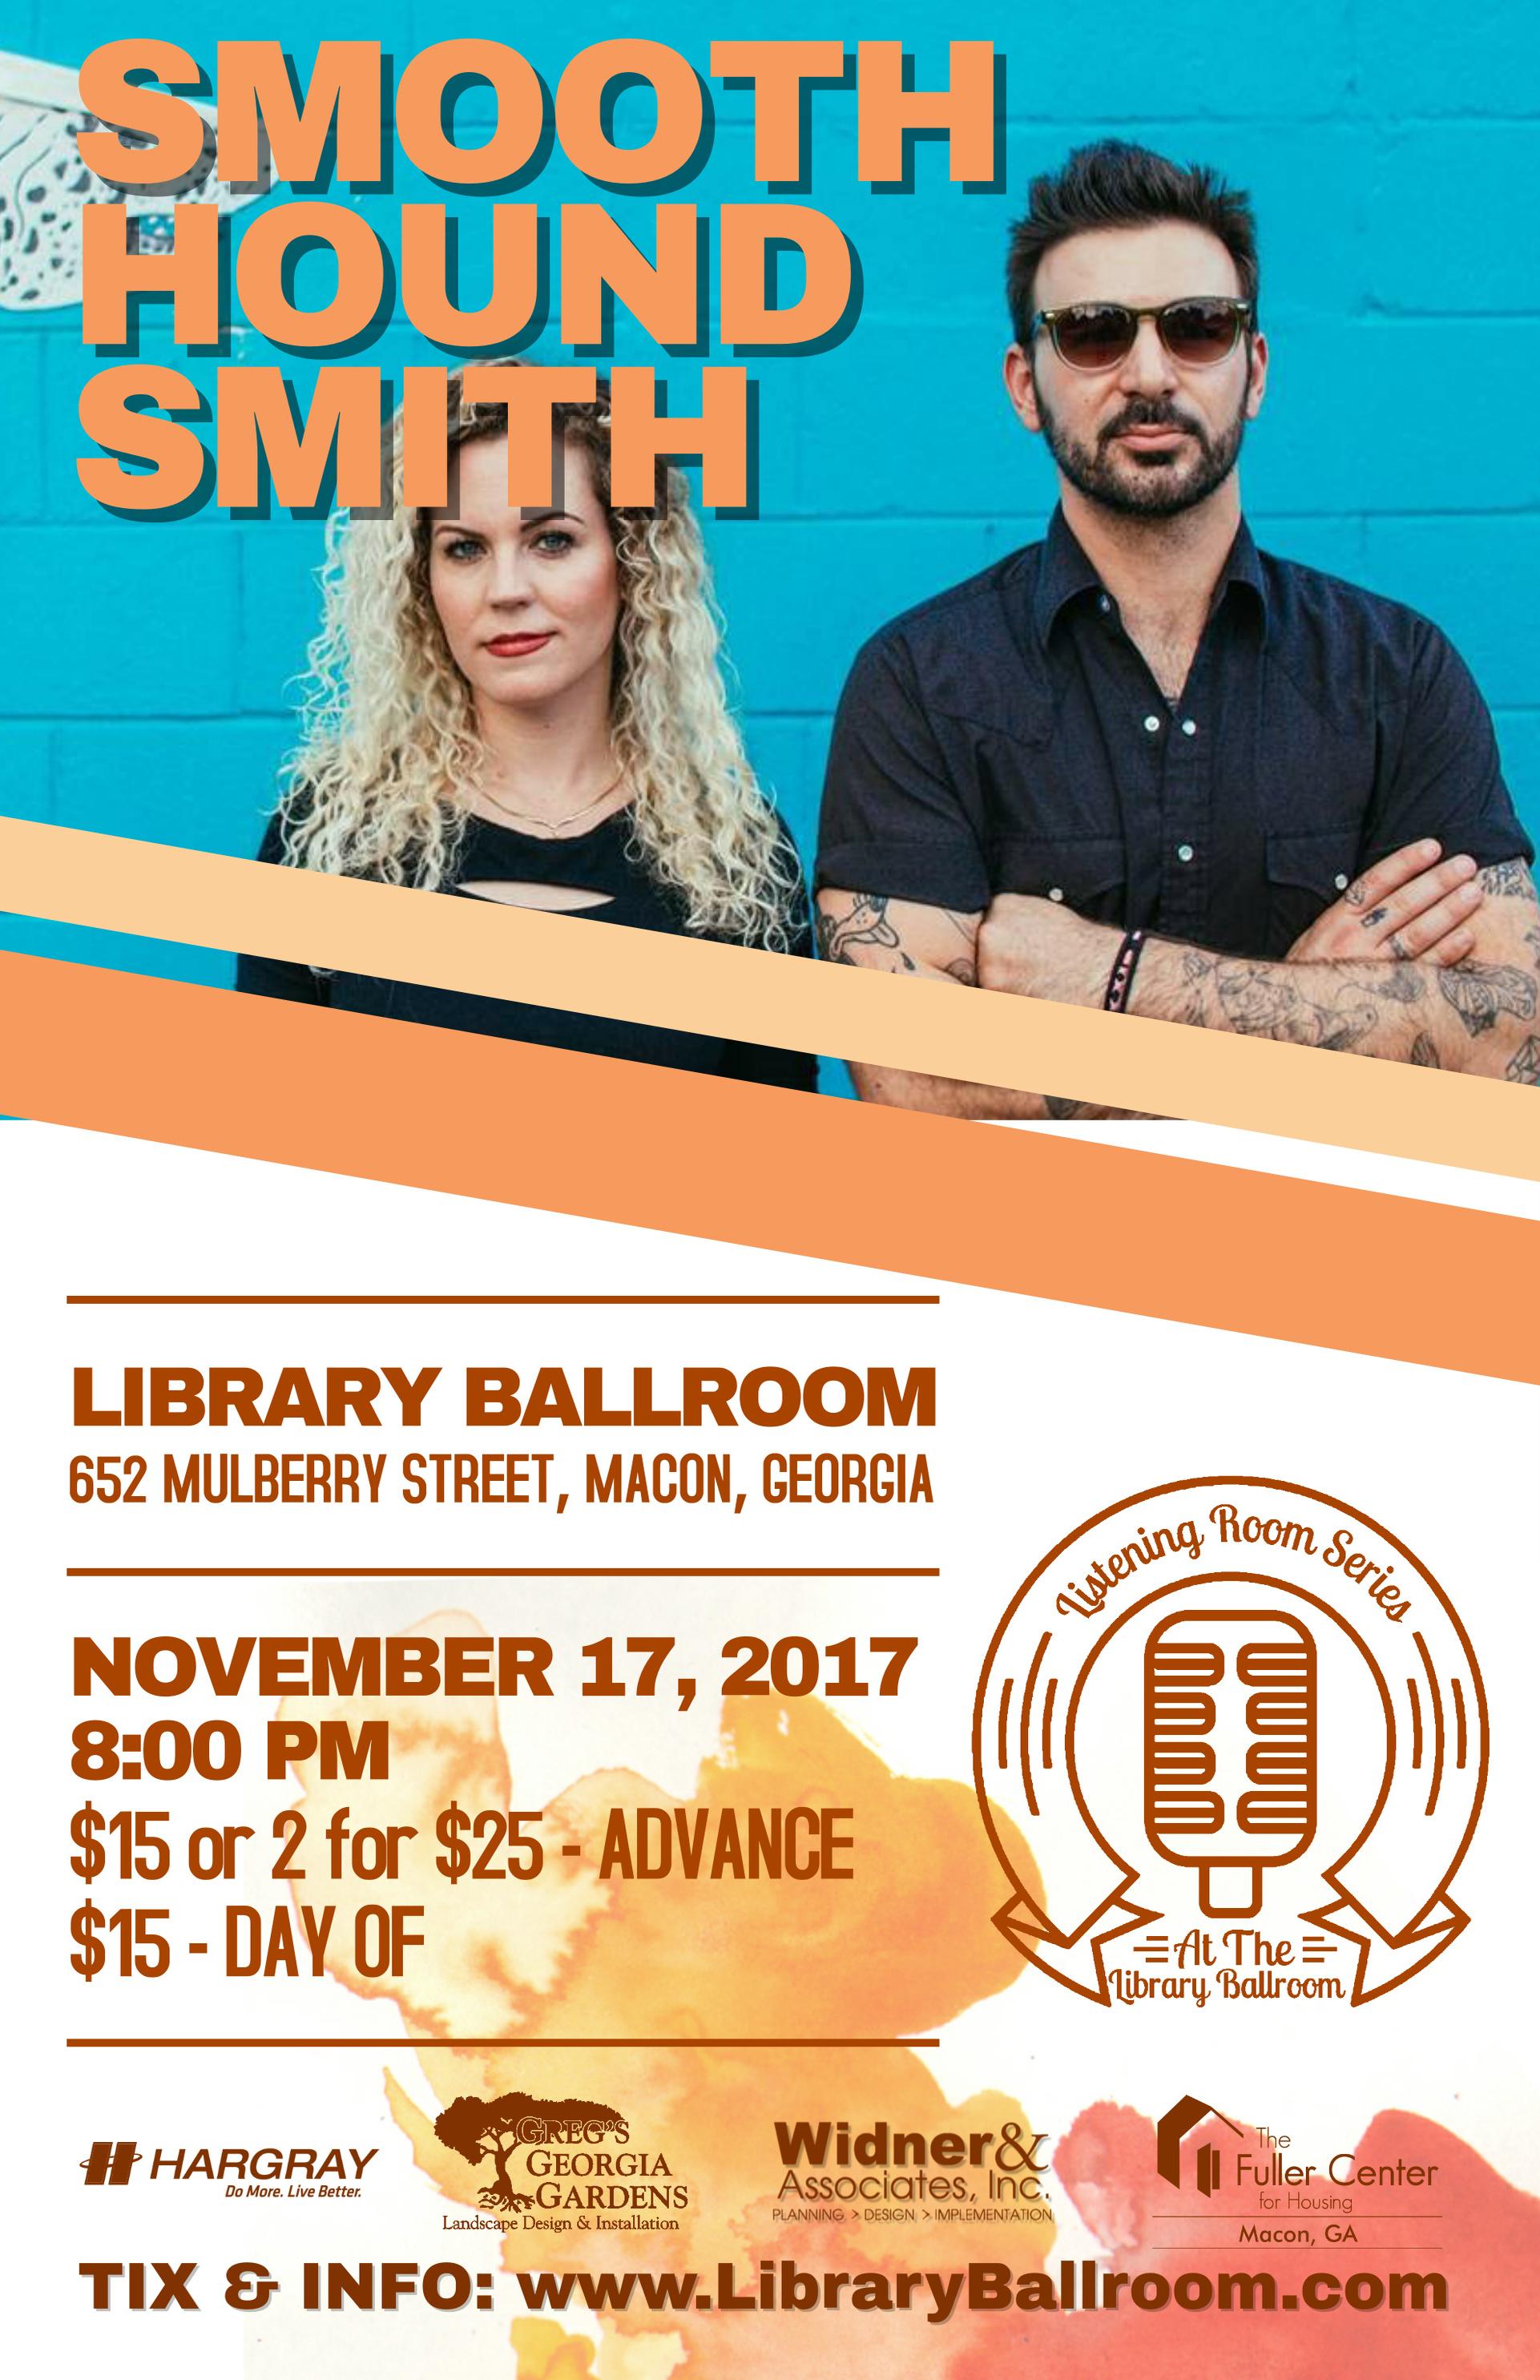 Listening Room Smooth Hound Smith Library Ballroom (1).jpg